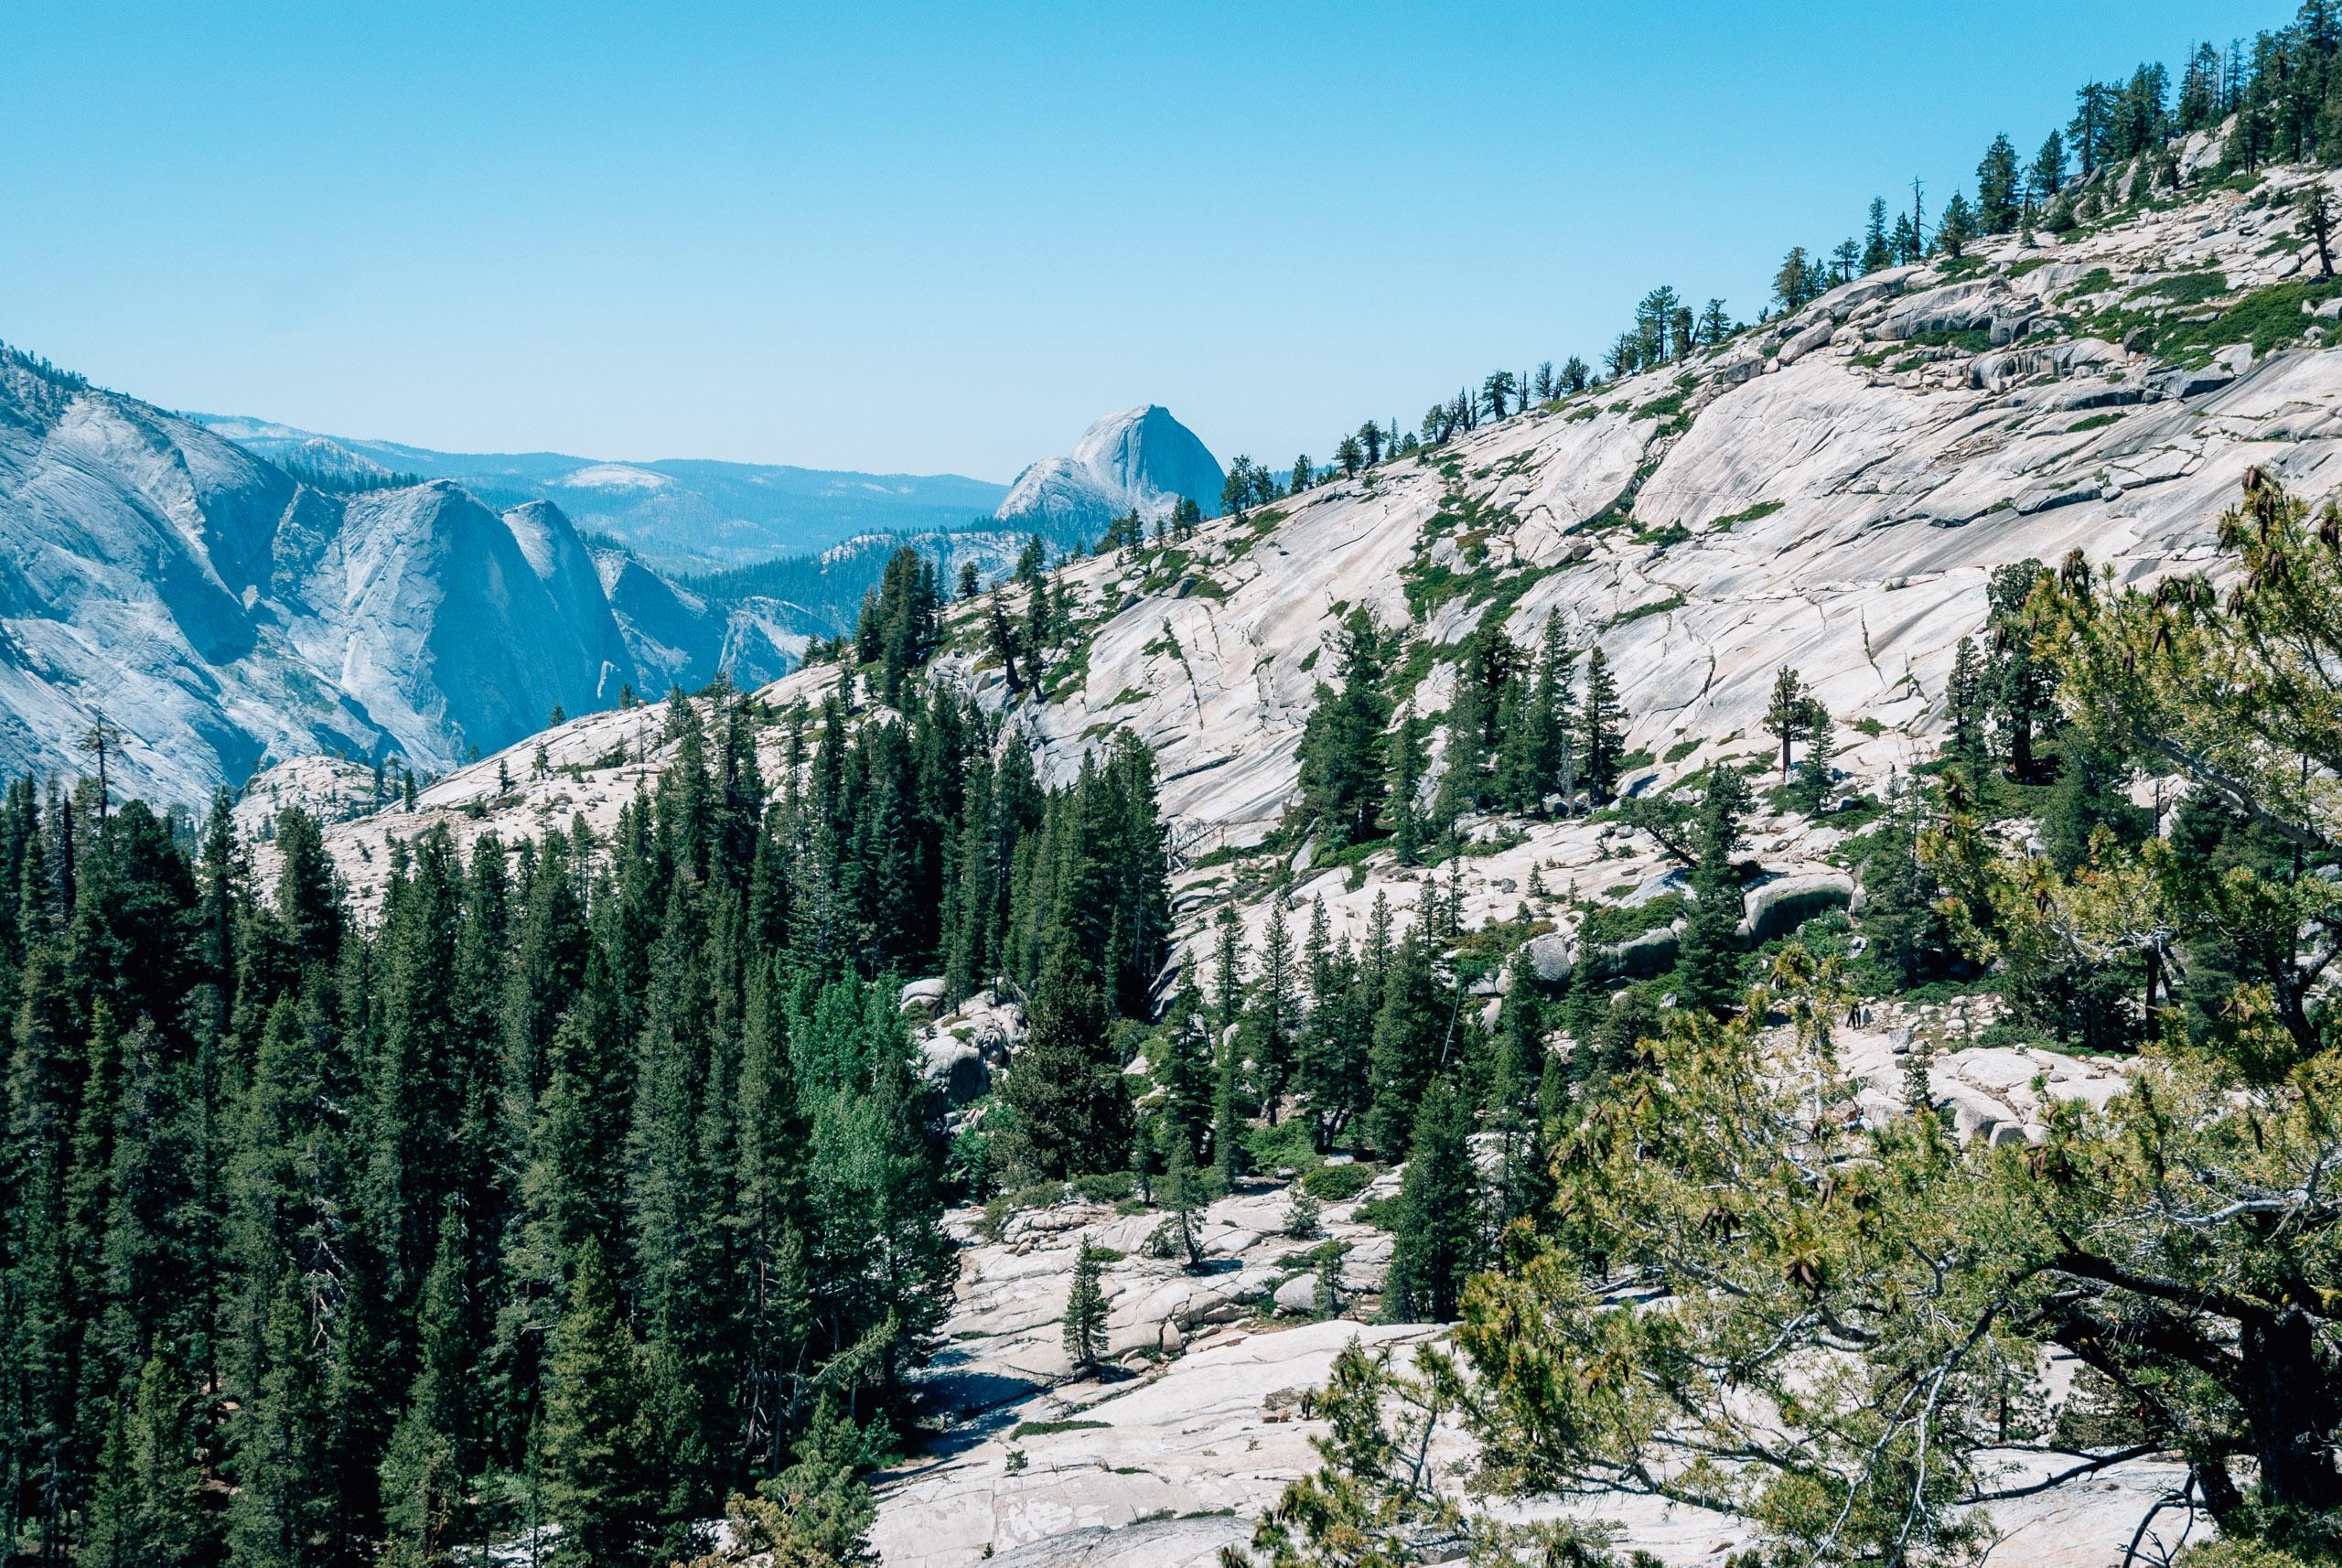 Yosemite National Park - 2010-0723-DSC_0072_103094